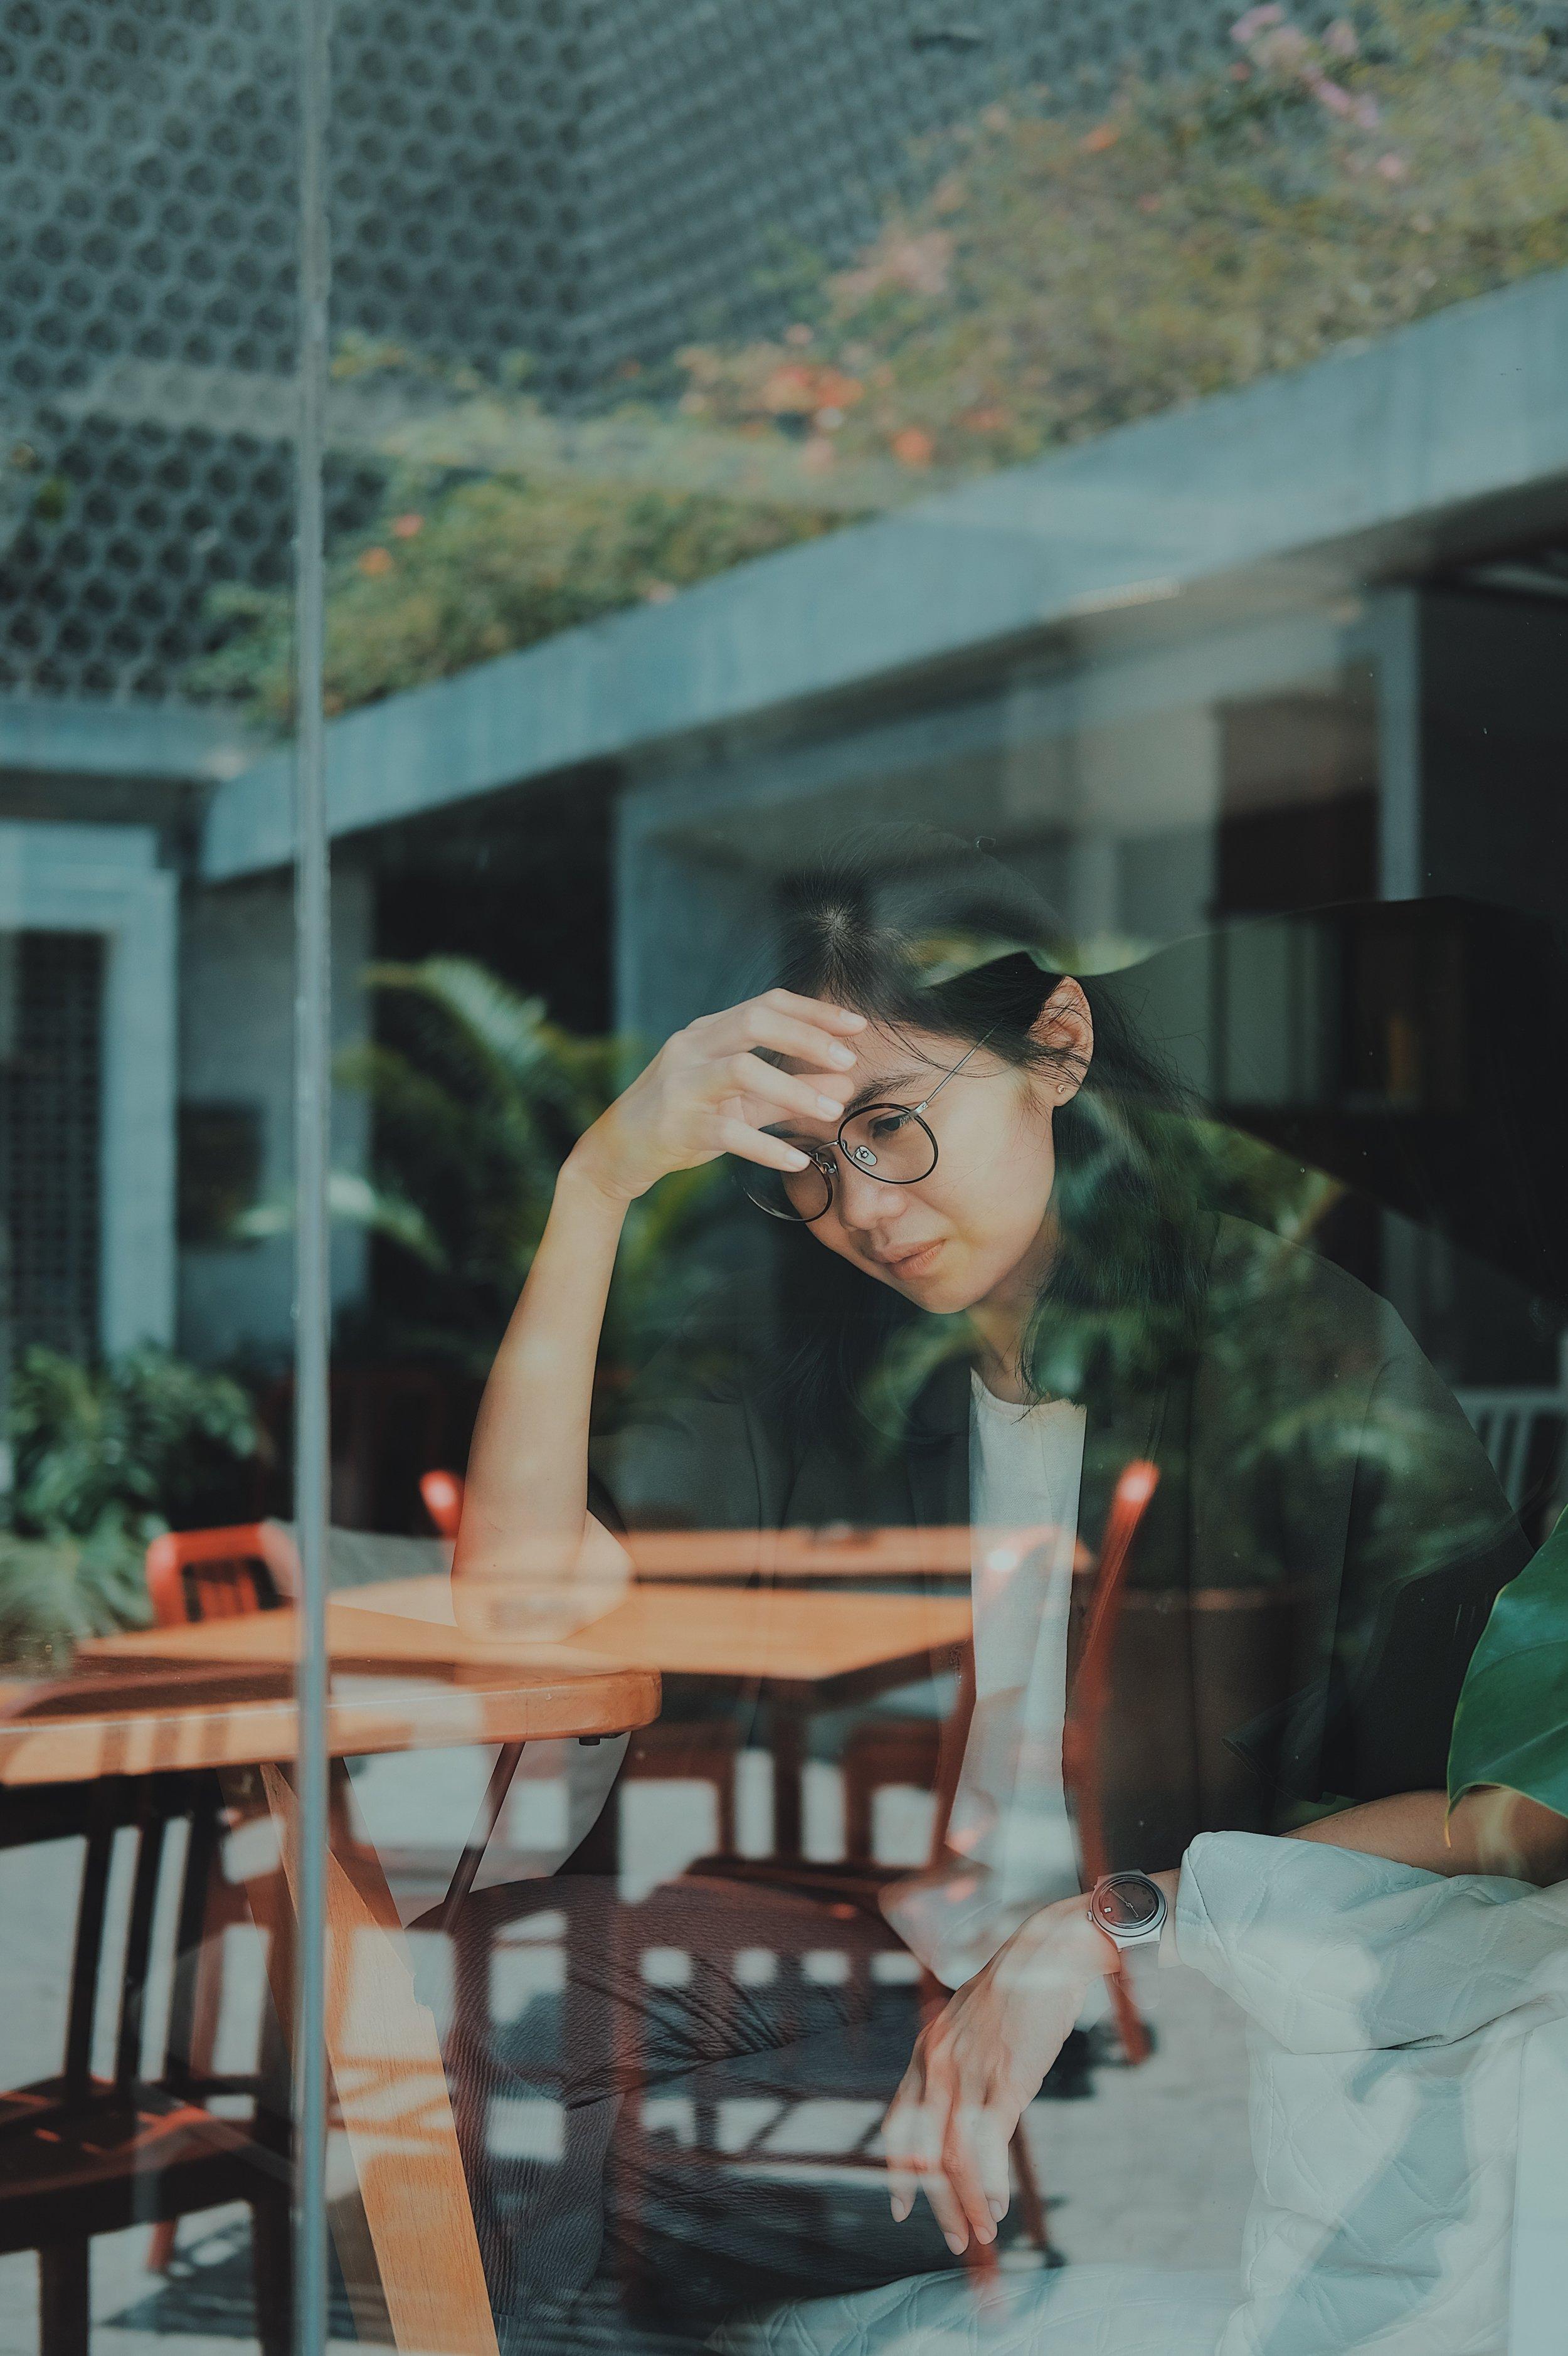 Decrease Depression & Anxiety